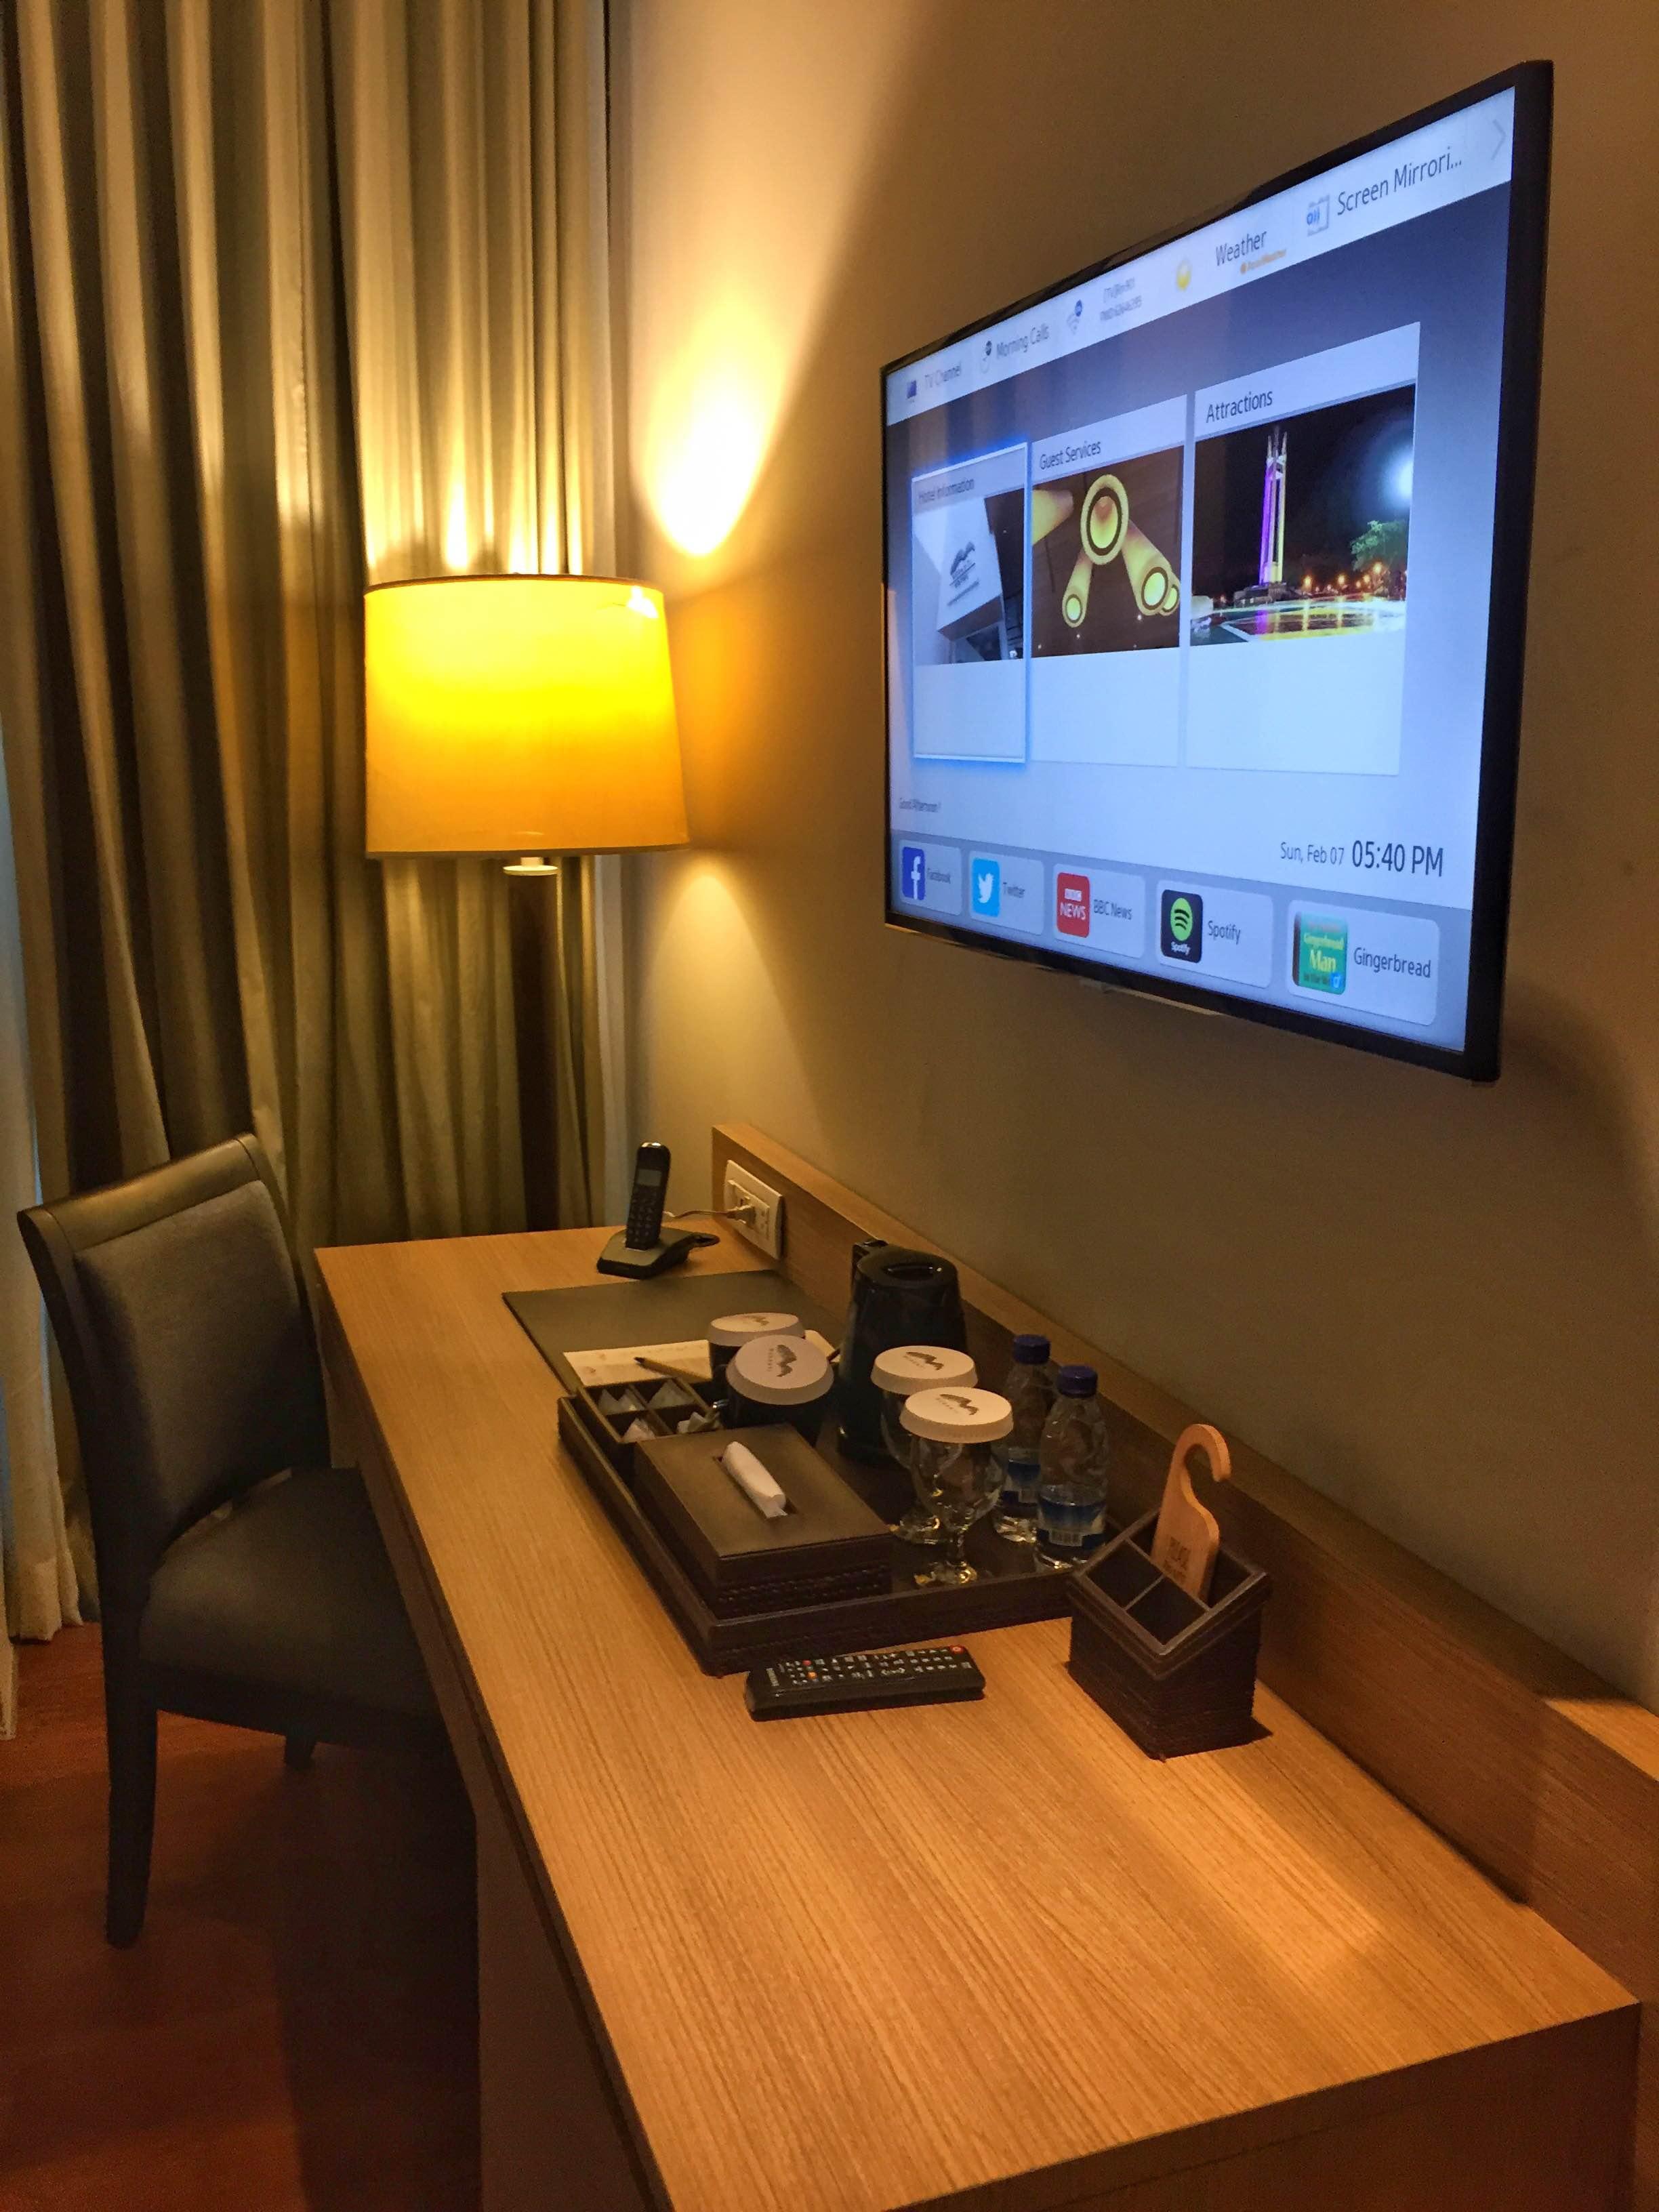 Meranti Smart TV